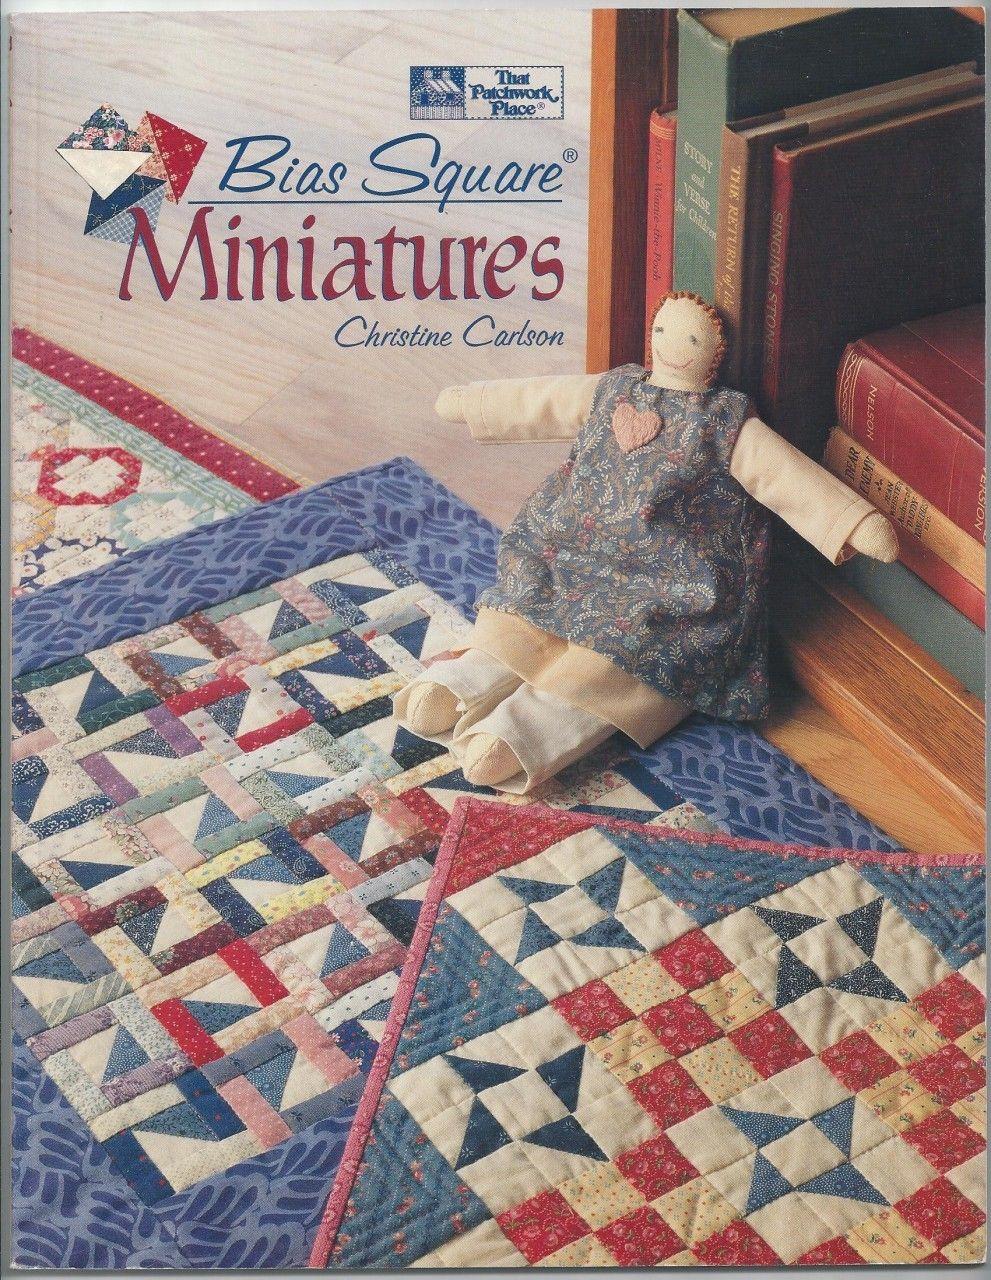 Bias square miniatures quilting book christine carlson